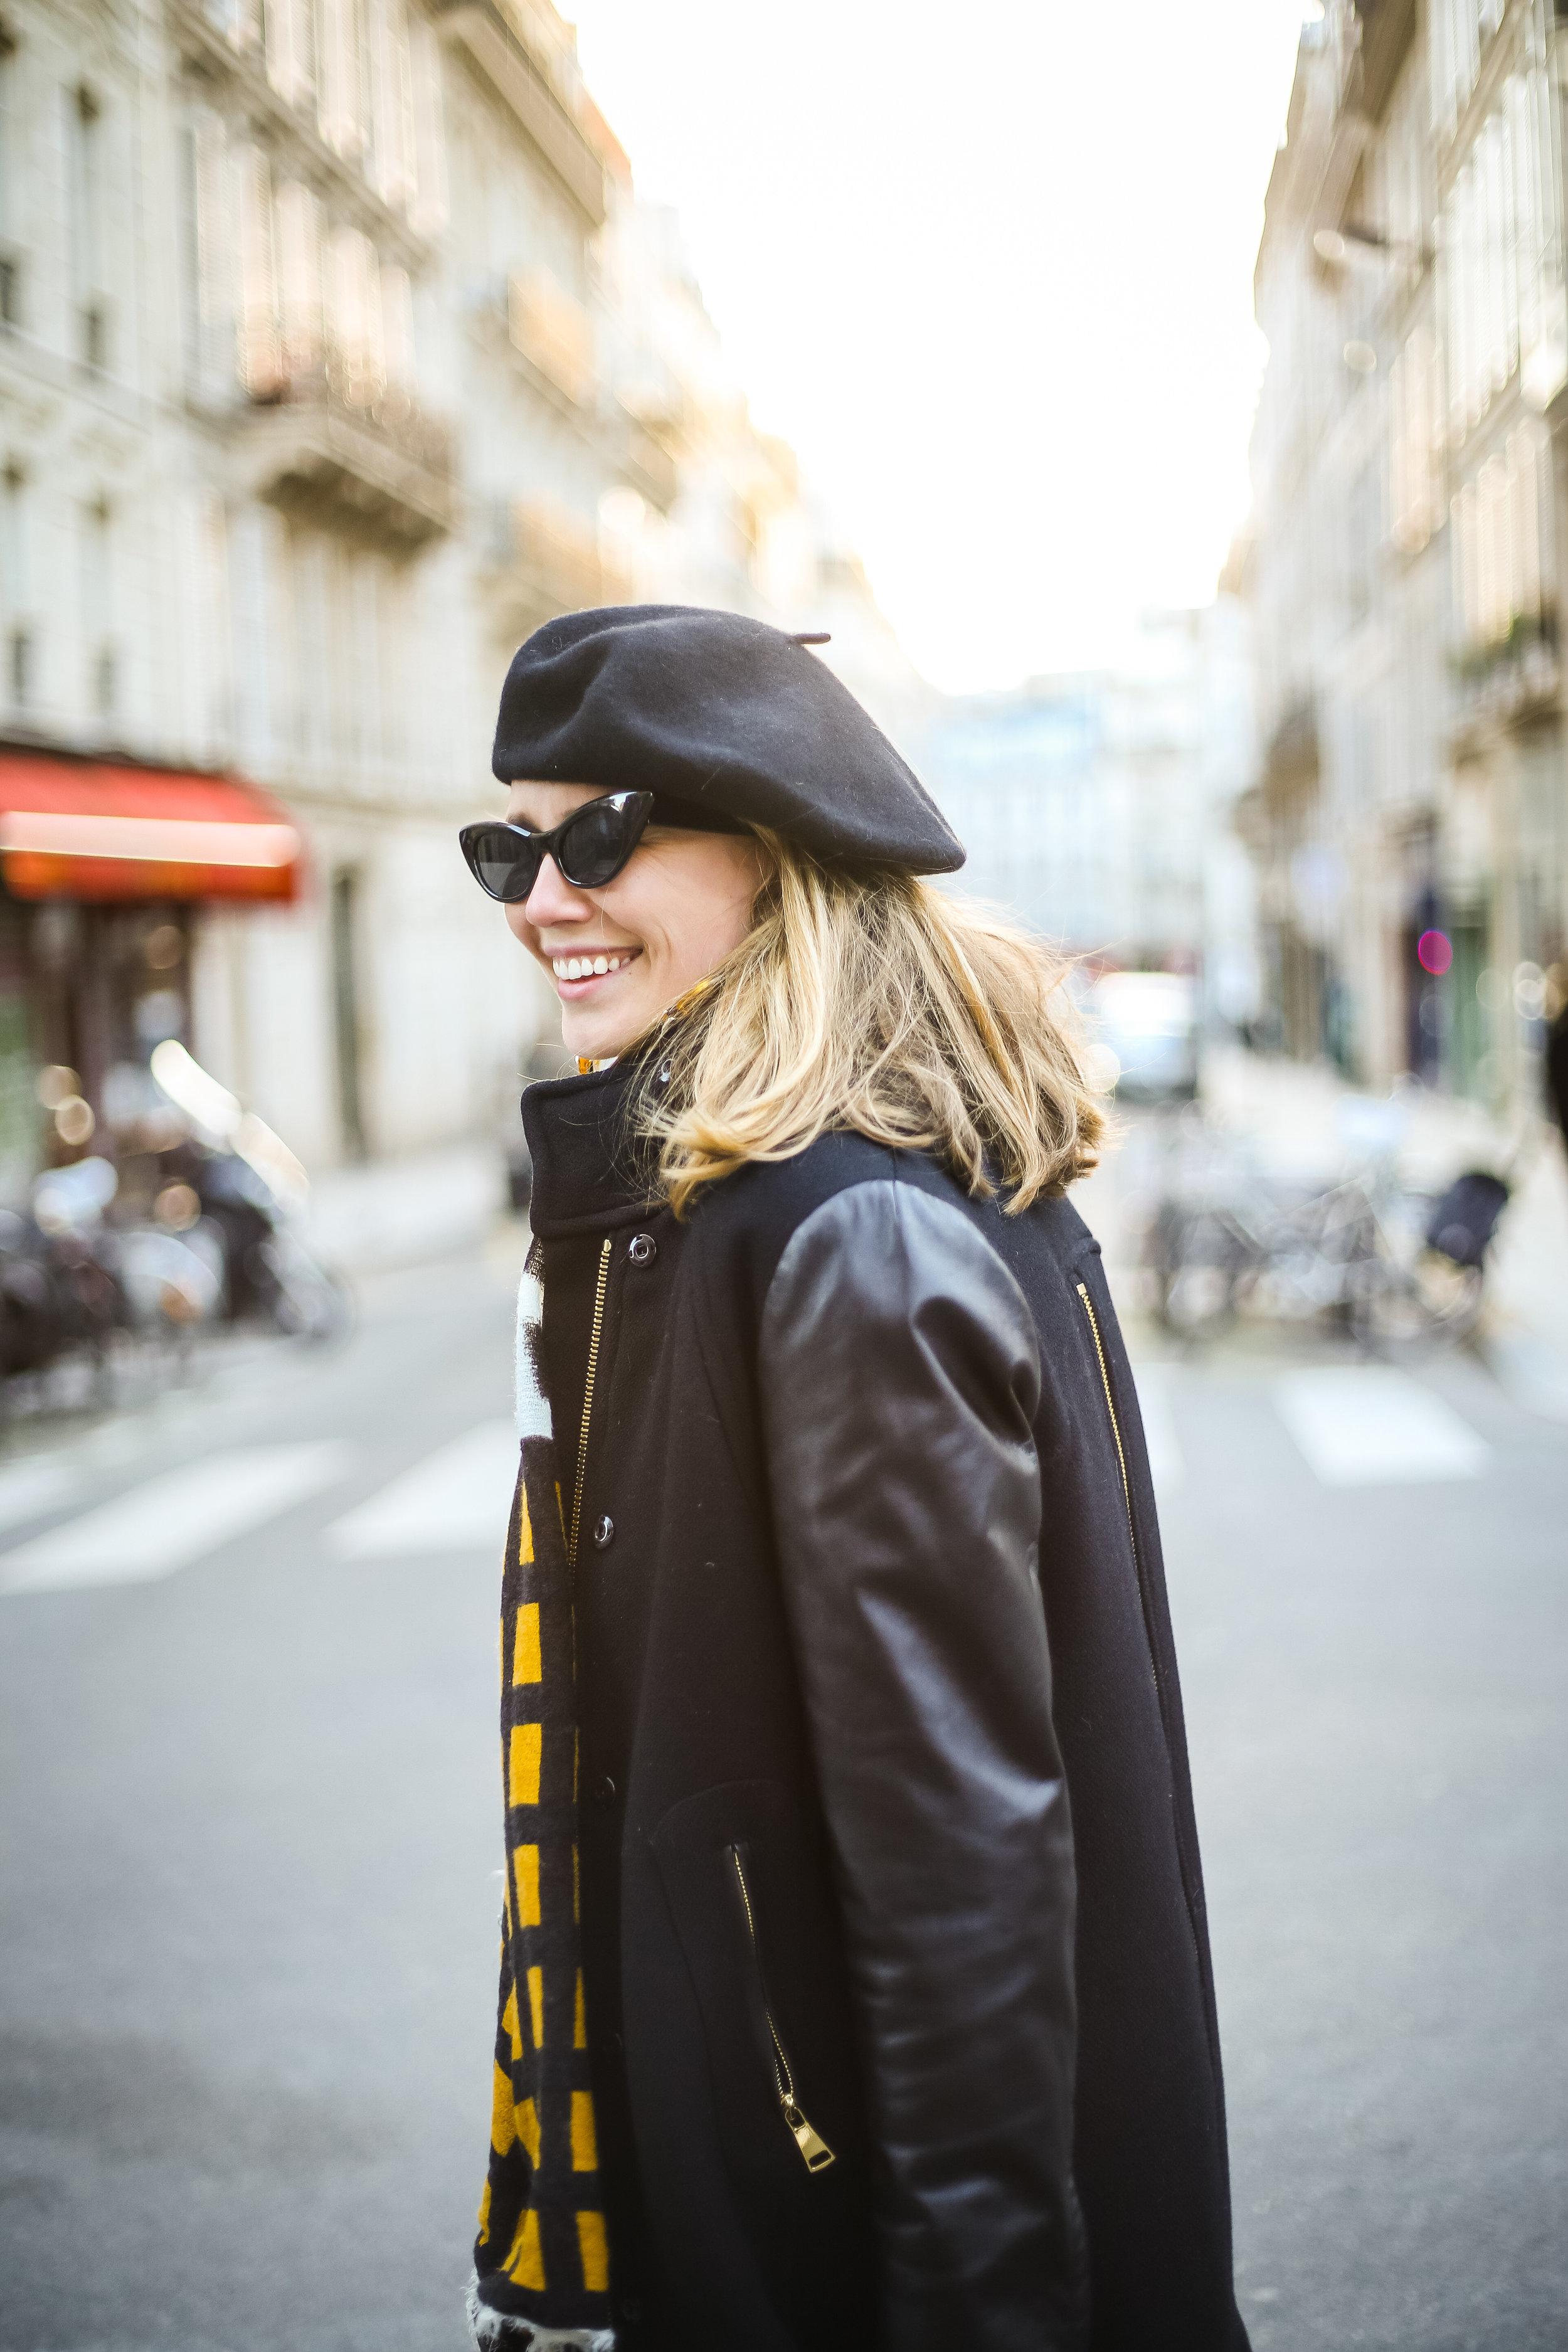 paris-outfit-ideas.jpg